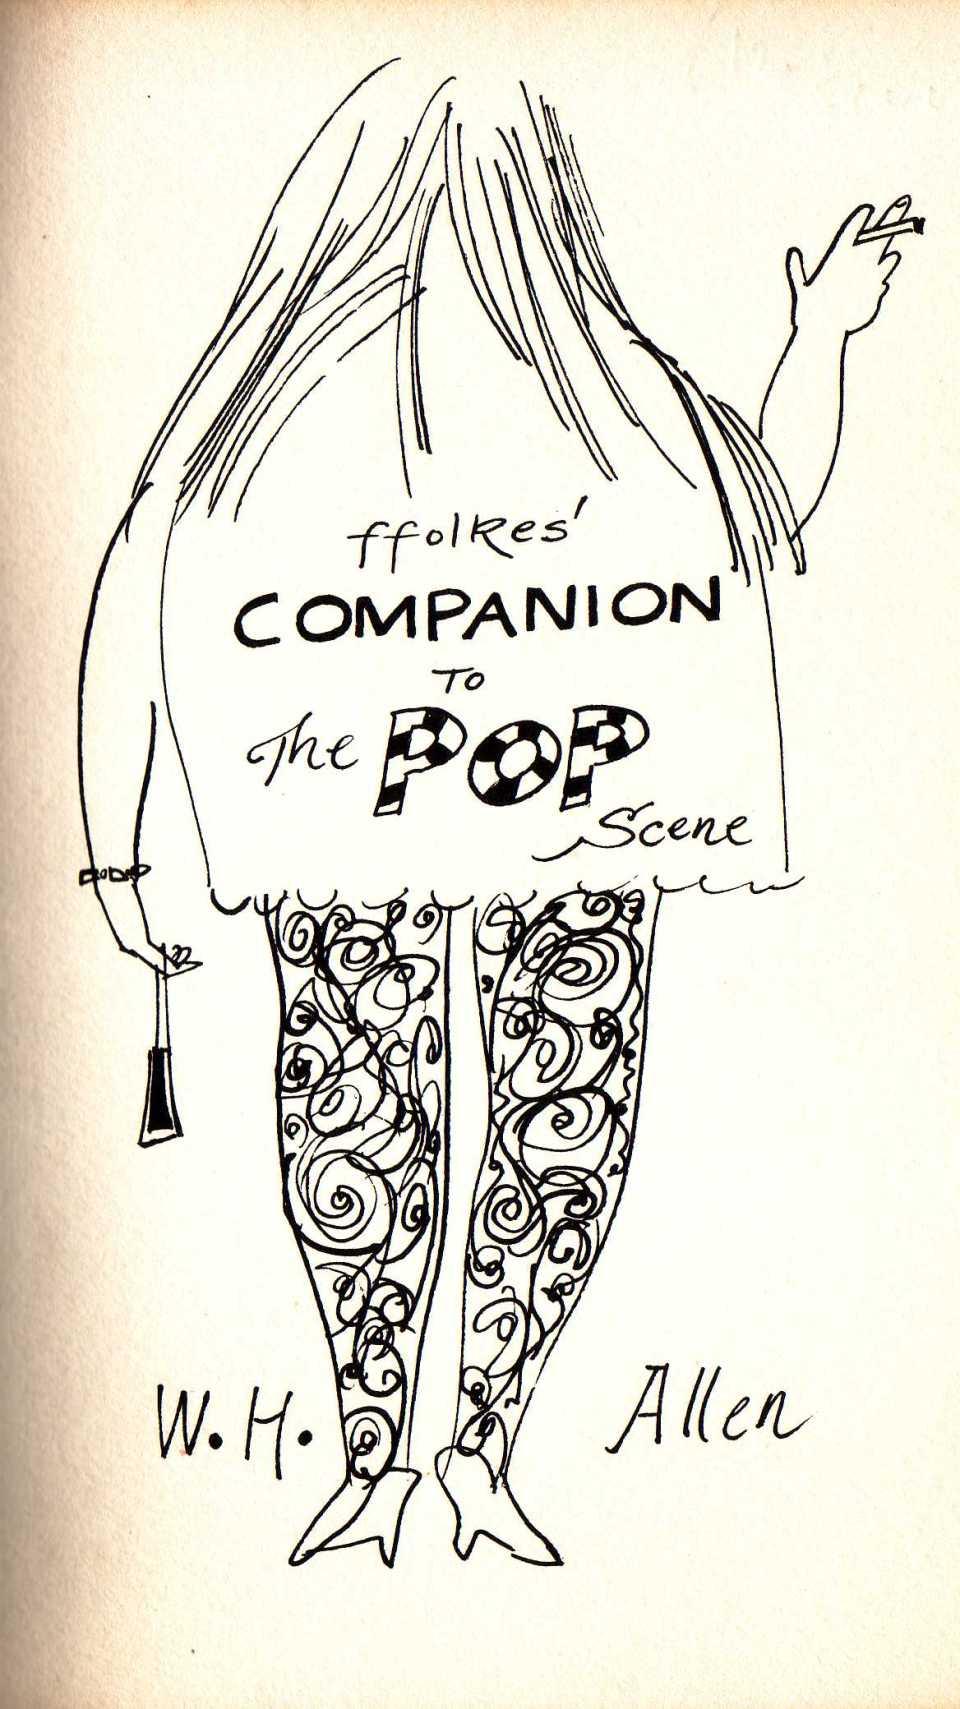 Companion title page